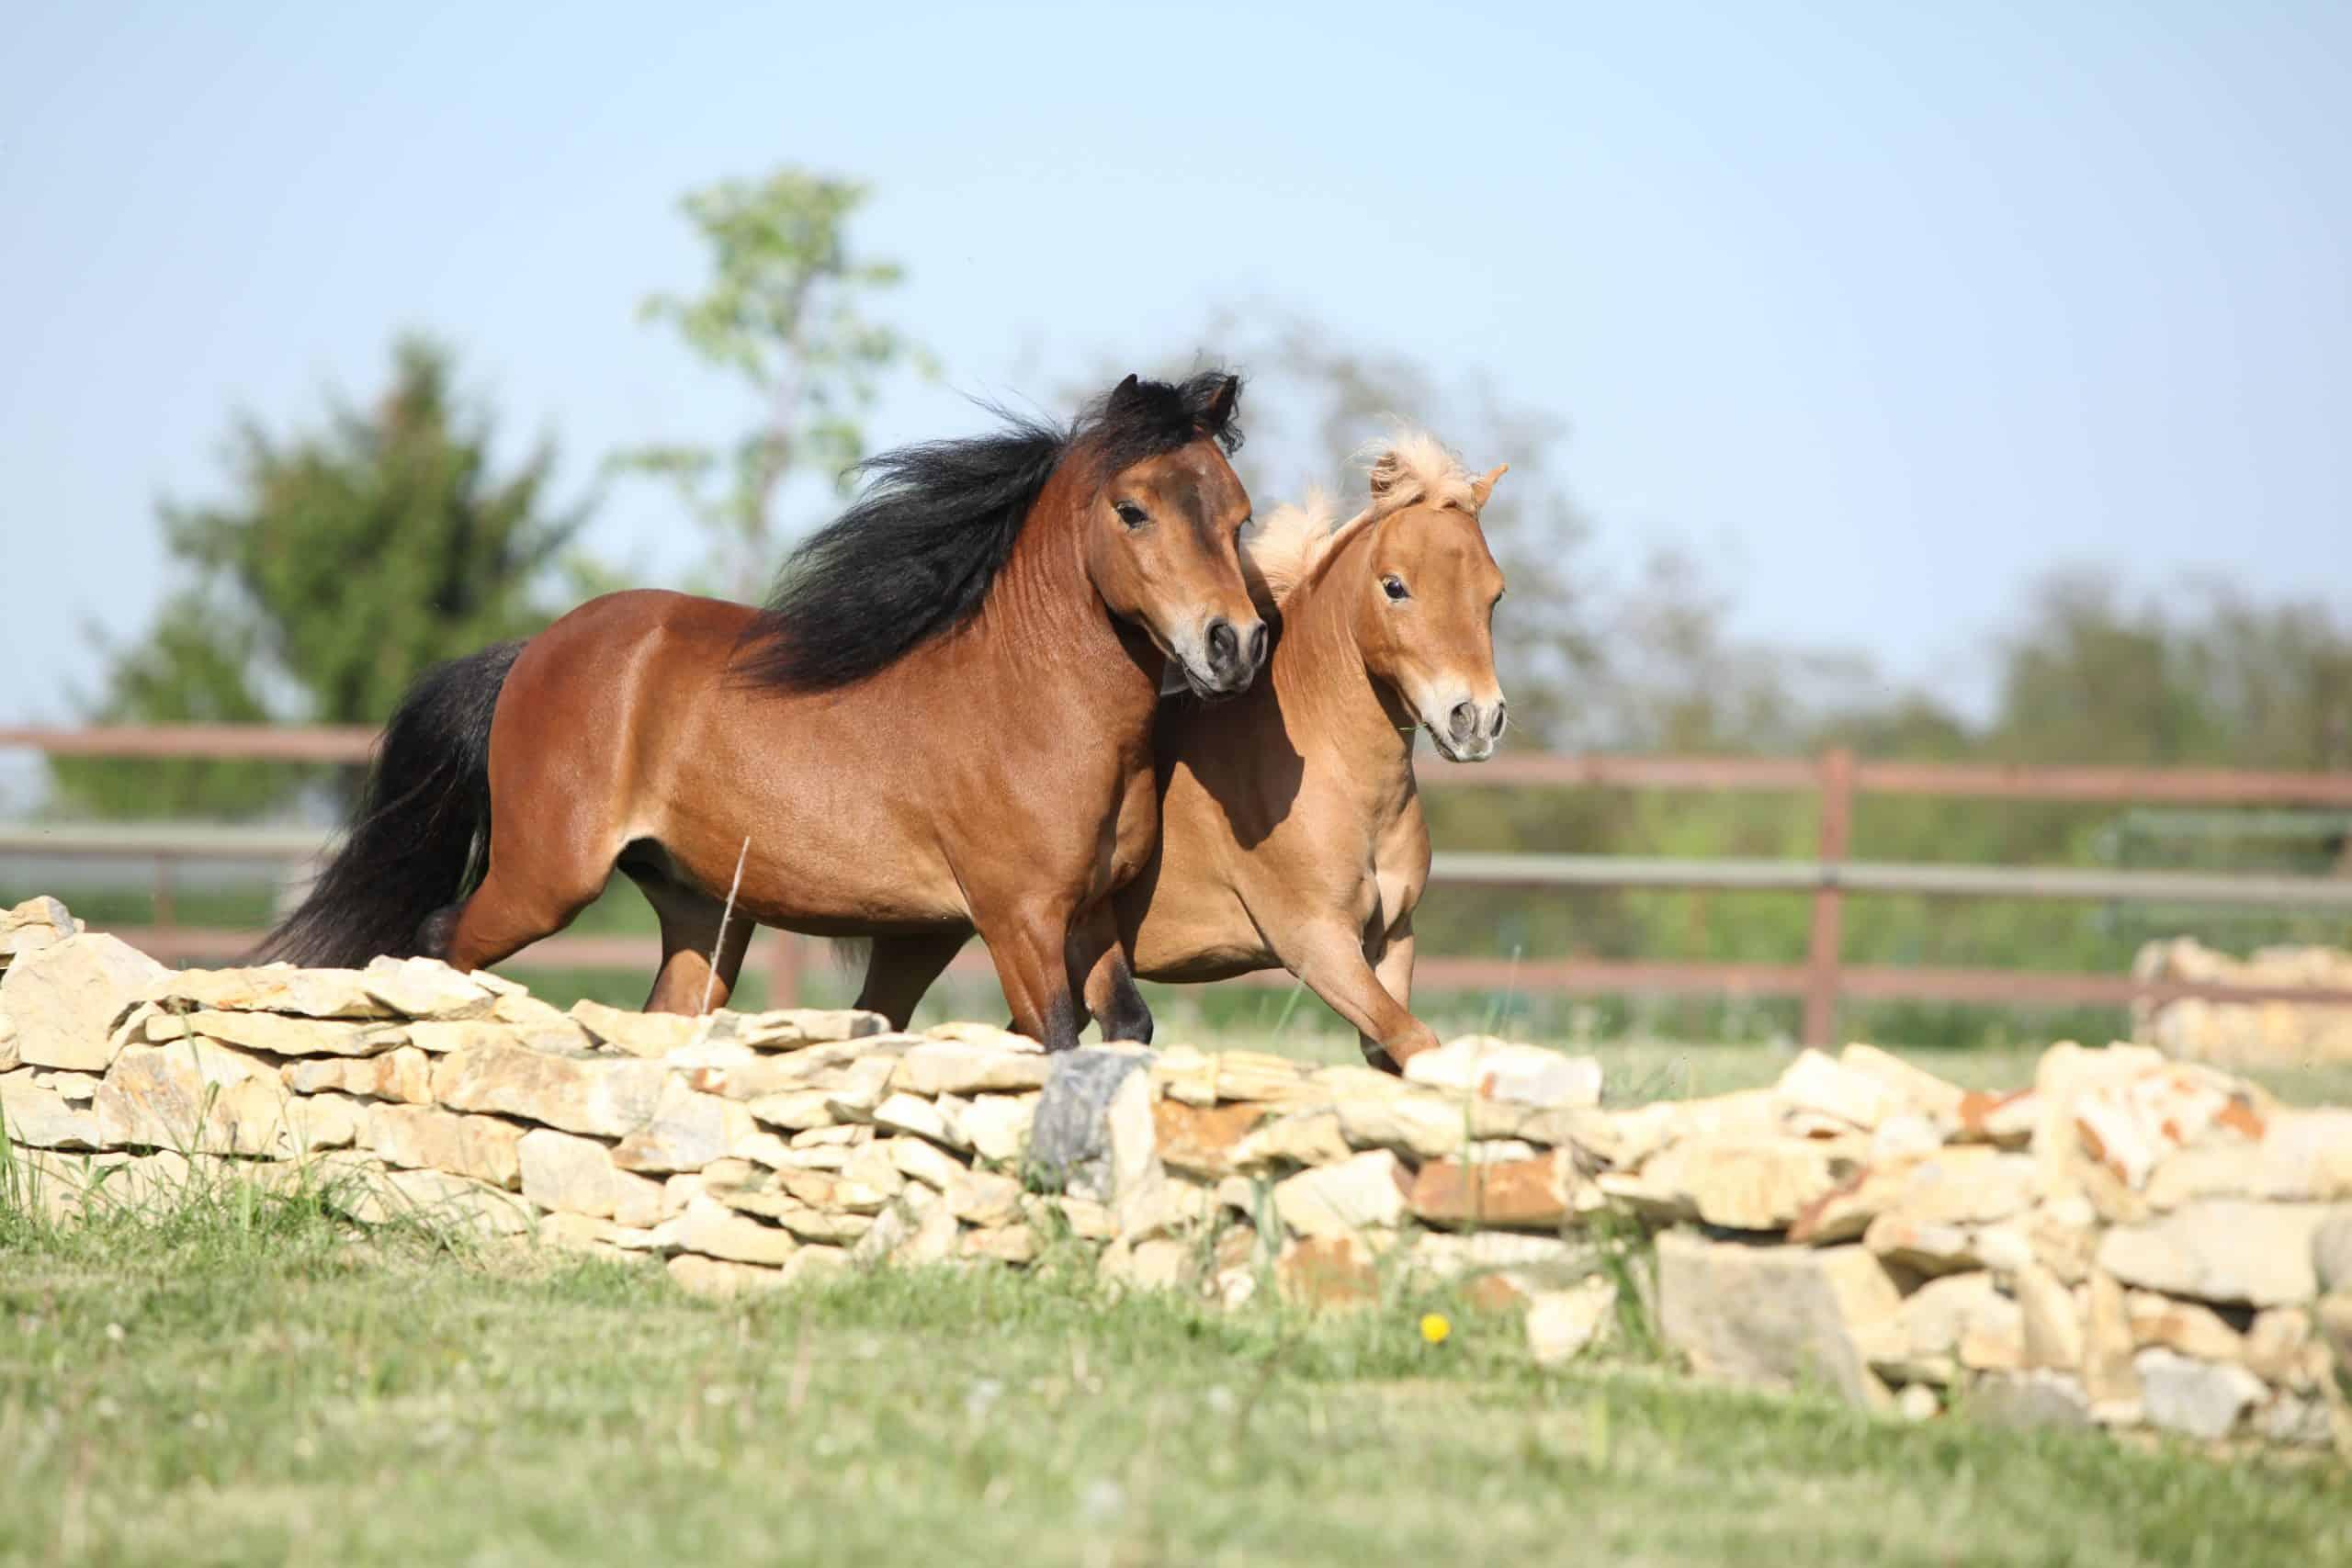 Two american miniature horses running